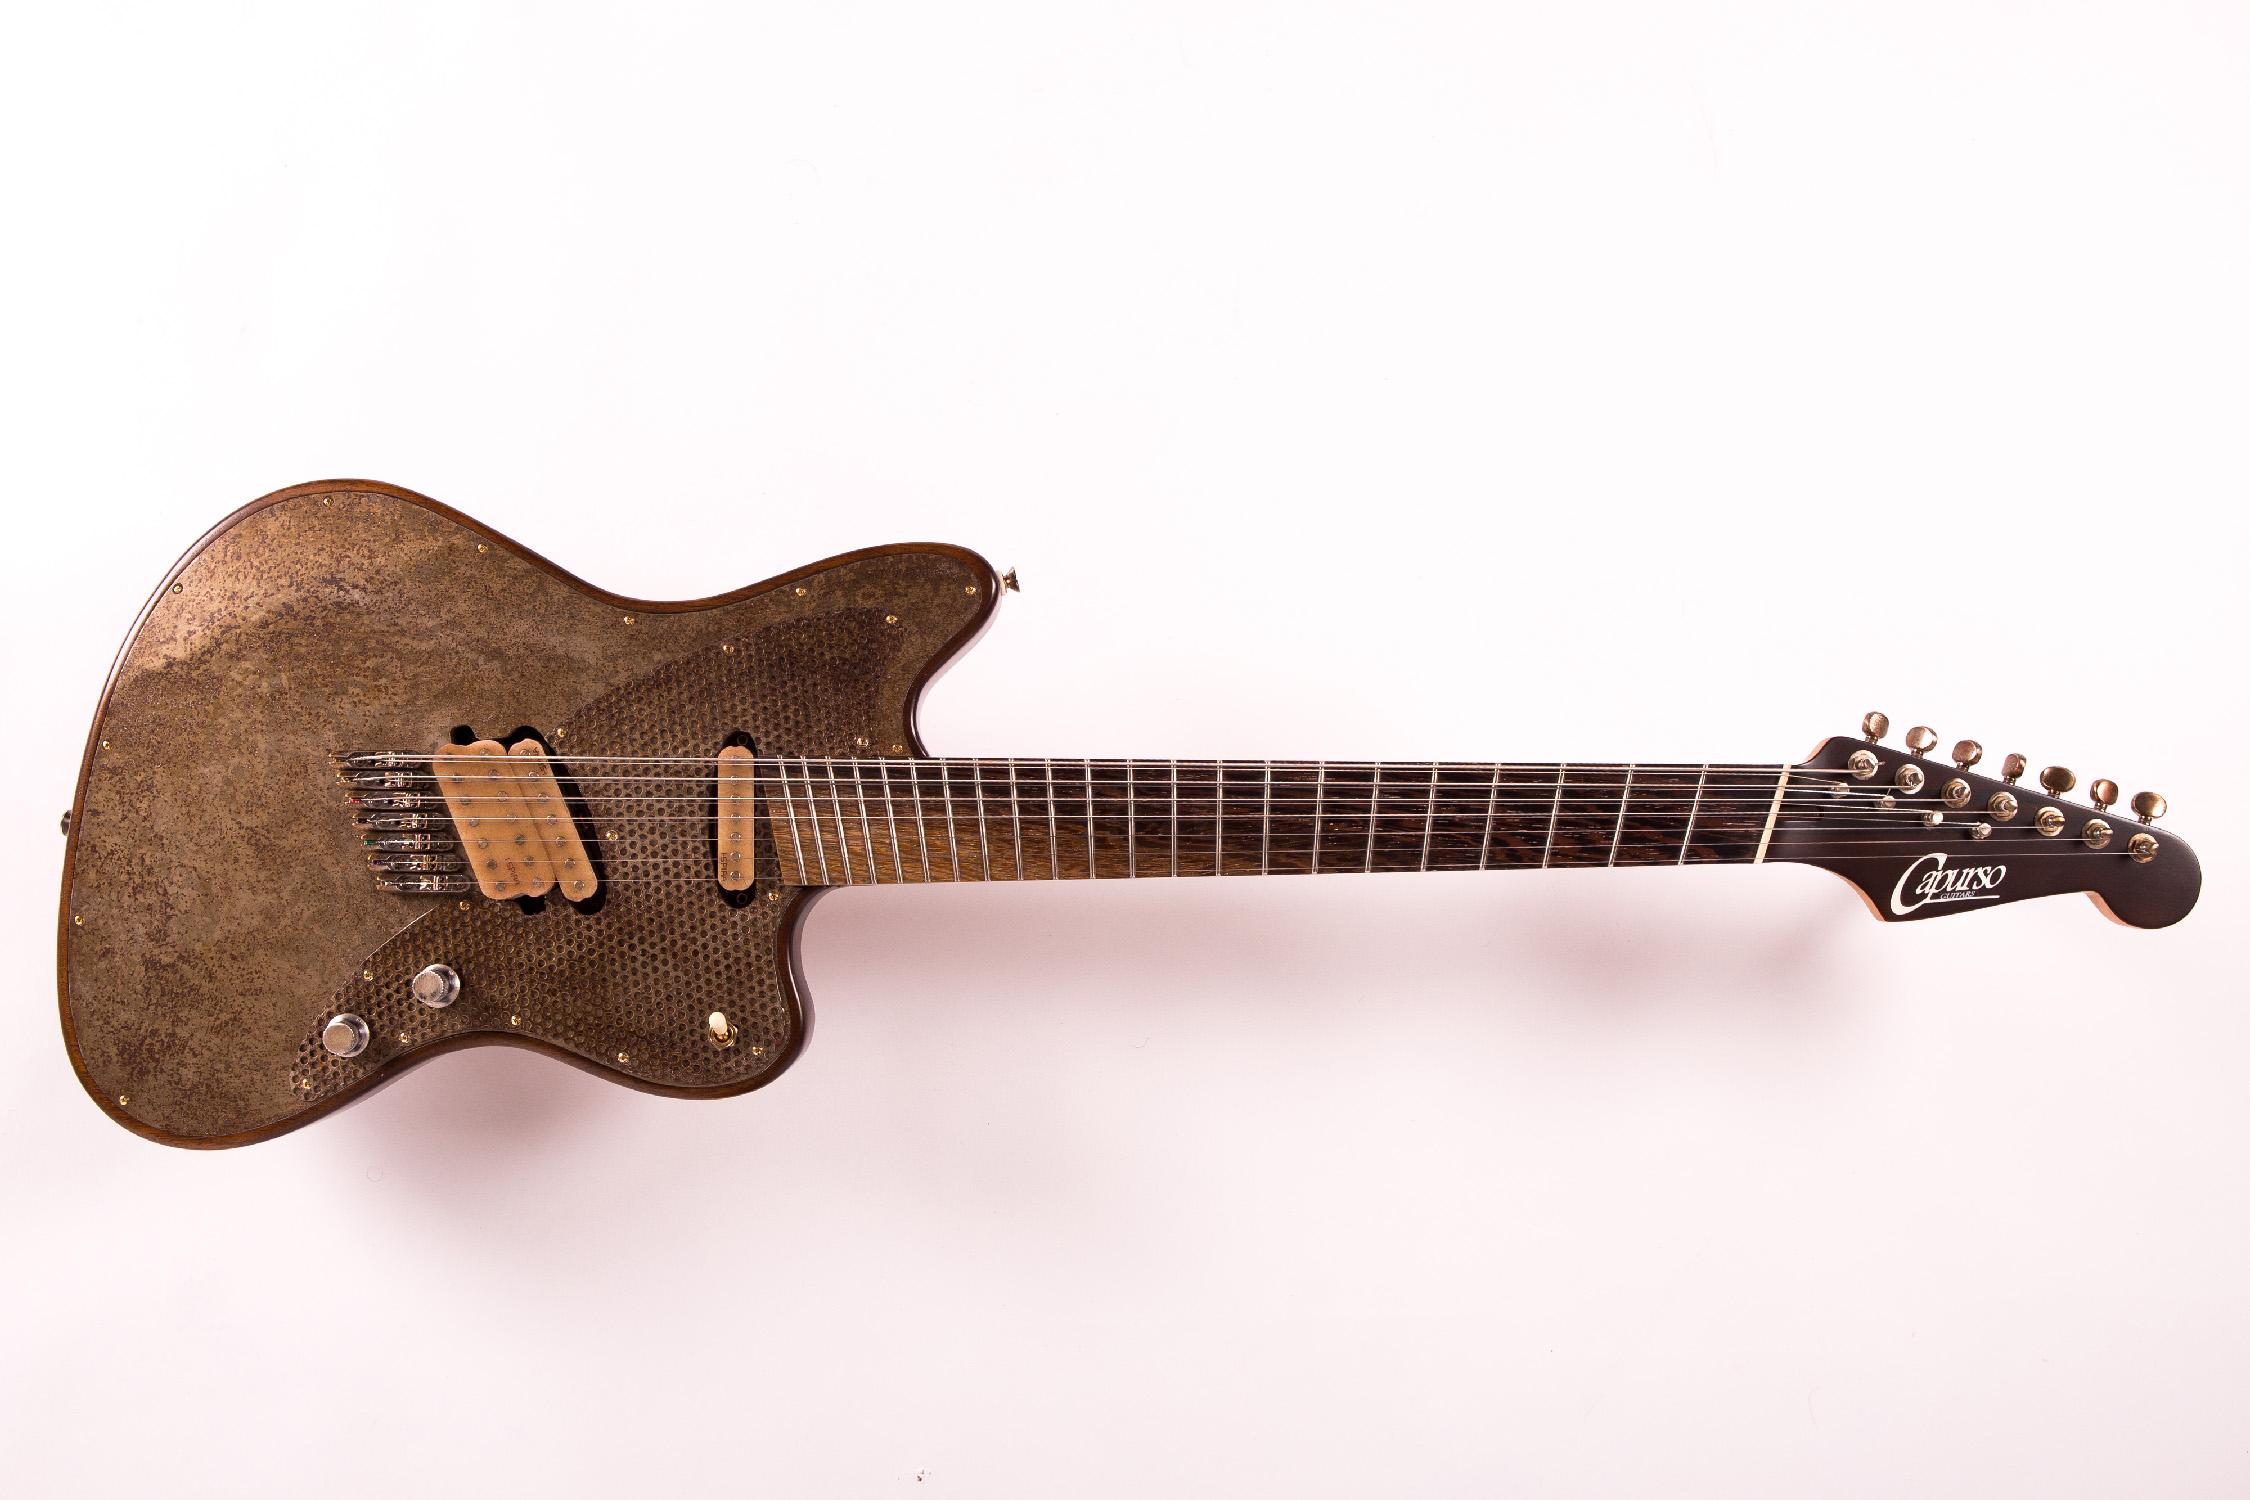 Capurso Guitarfoto © Giuseppe Di Viesto